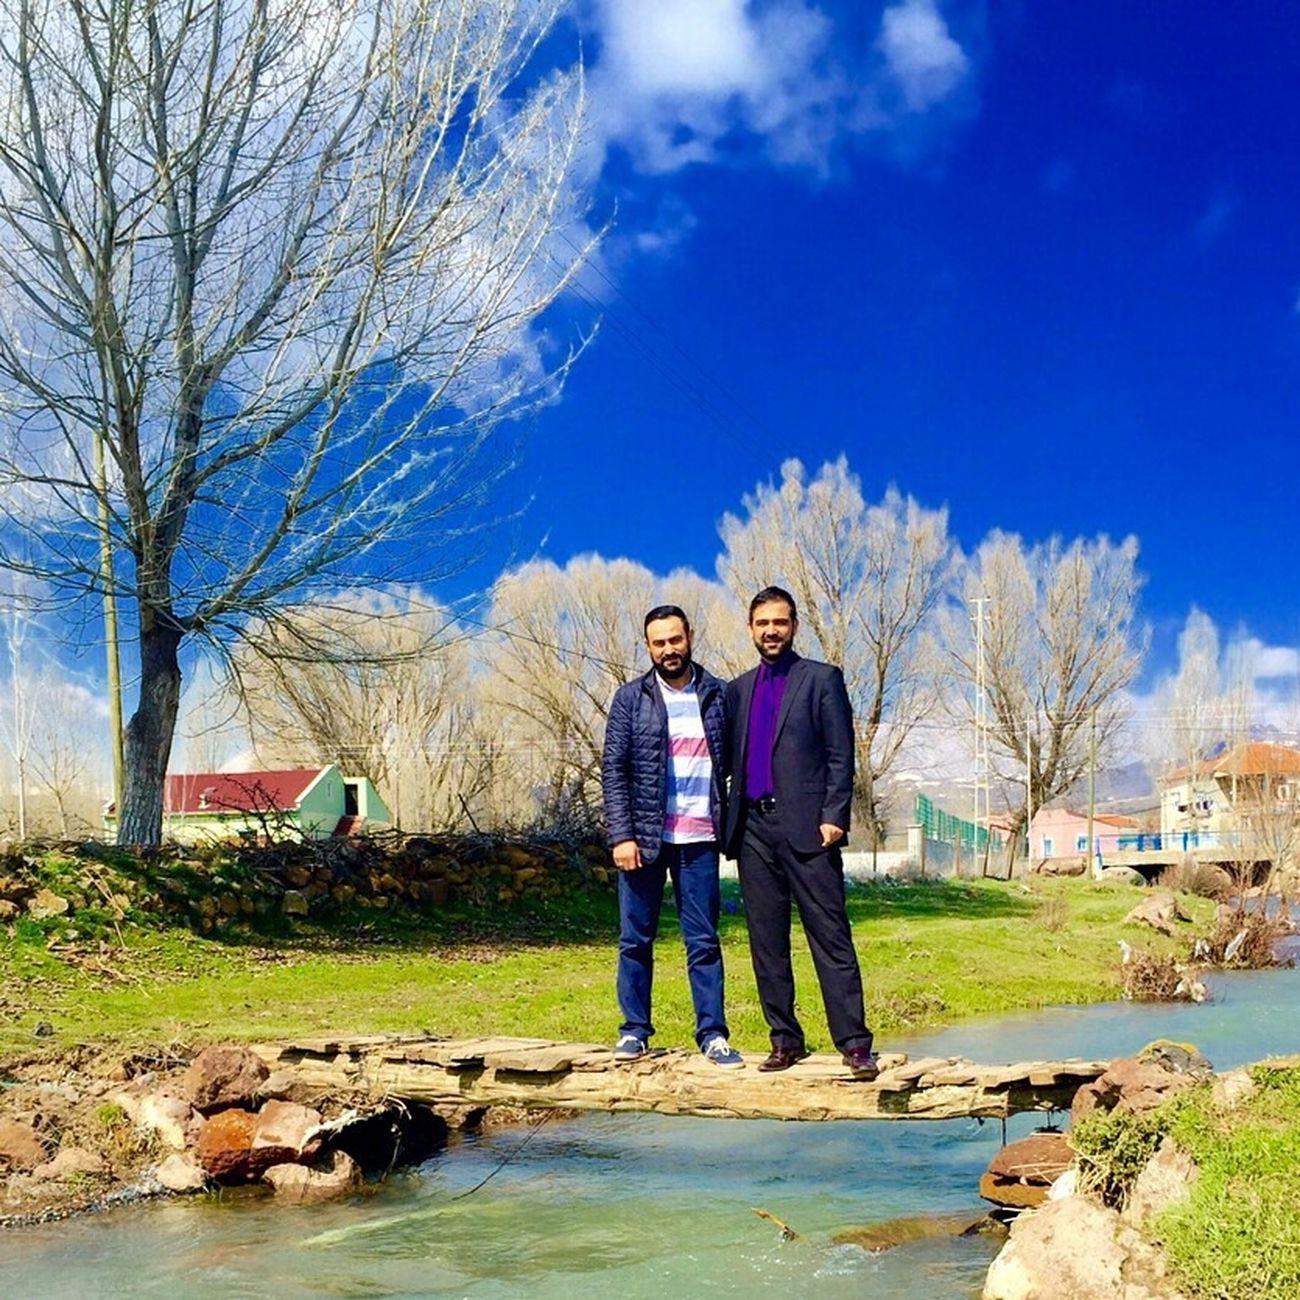 Kayseri Kayseri, Turkey Kayserili Kayseriden Kayseriresim Talas Kayseride Yamaçlı